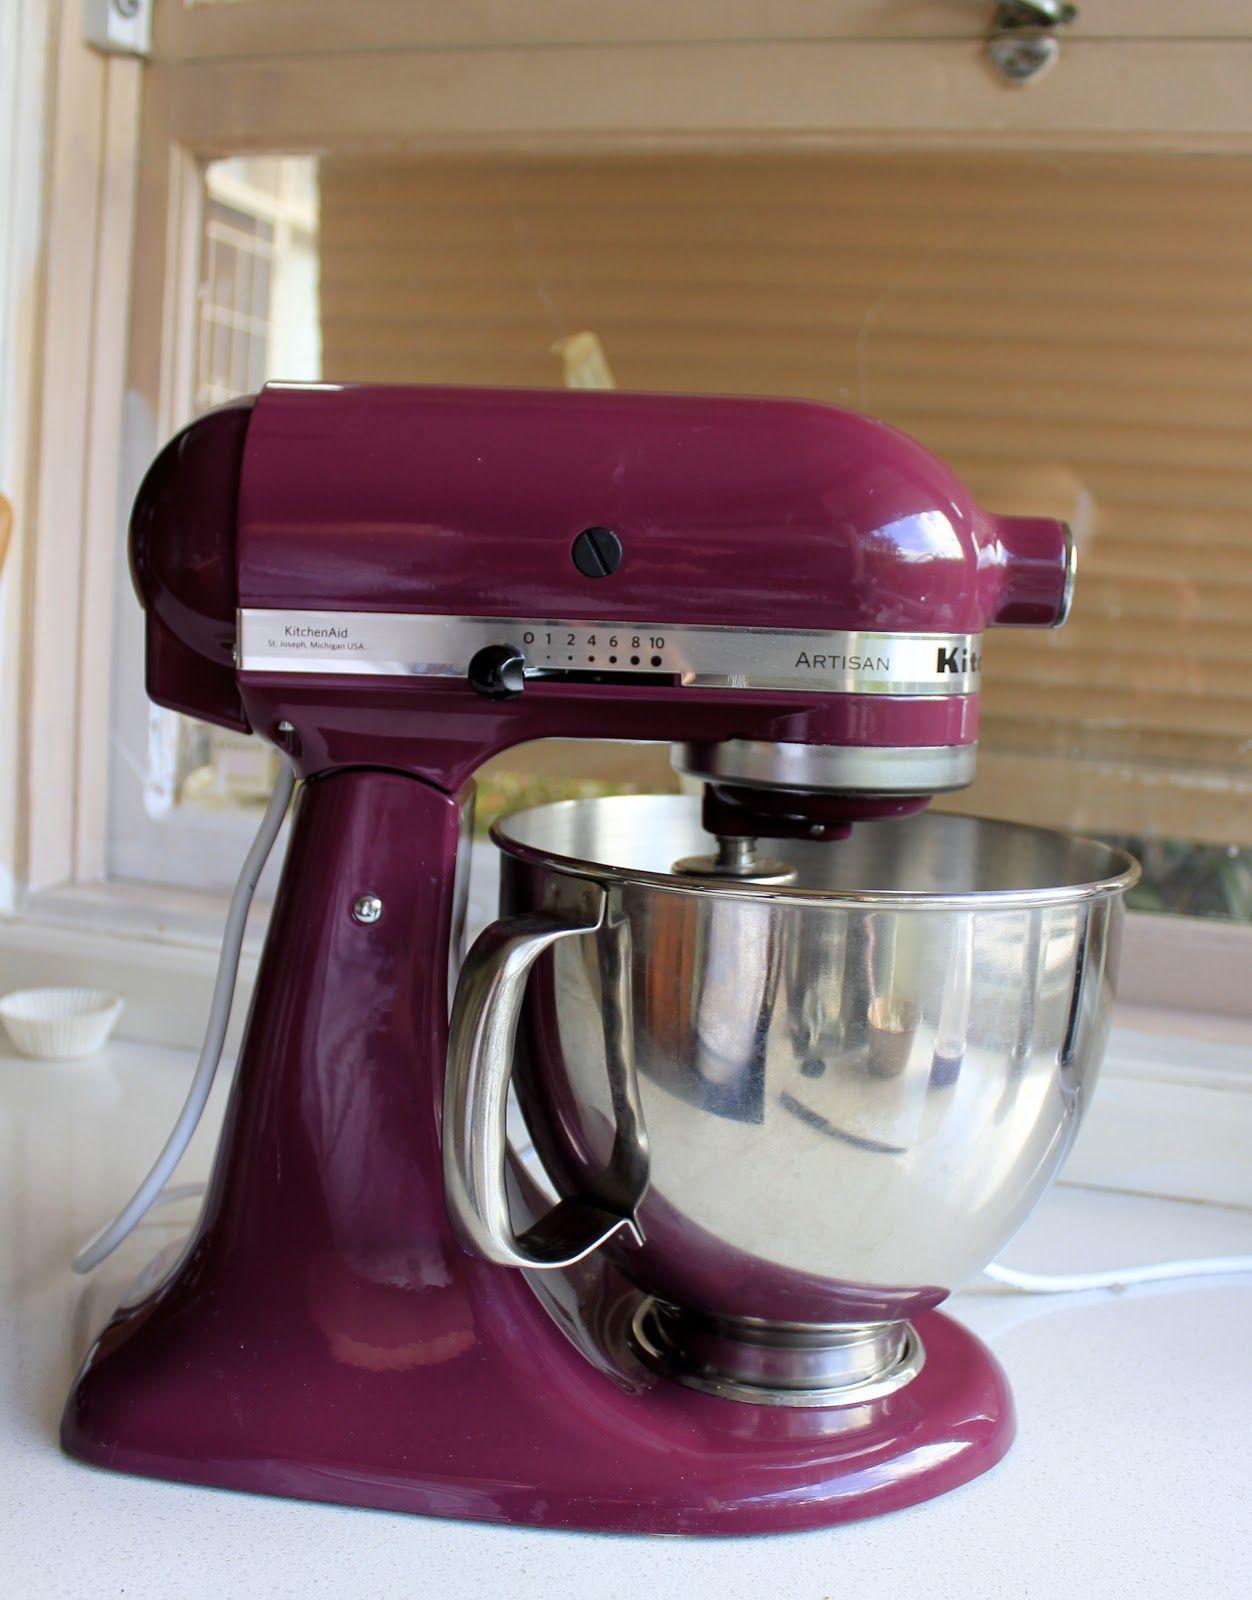 boysenberry kitchenaid my kitchen items kitchen appliances rh pinterest com